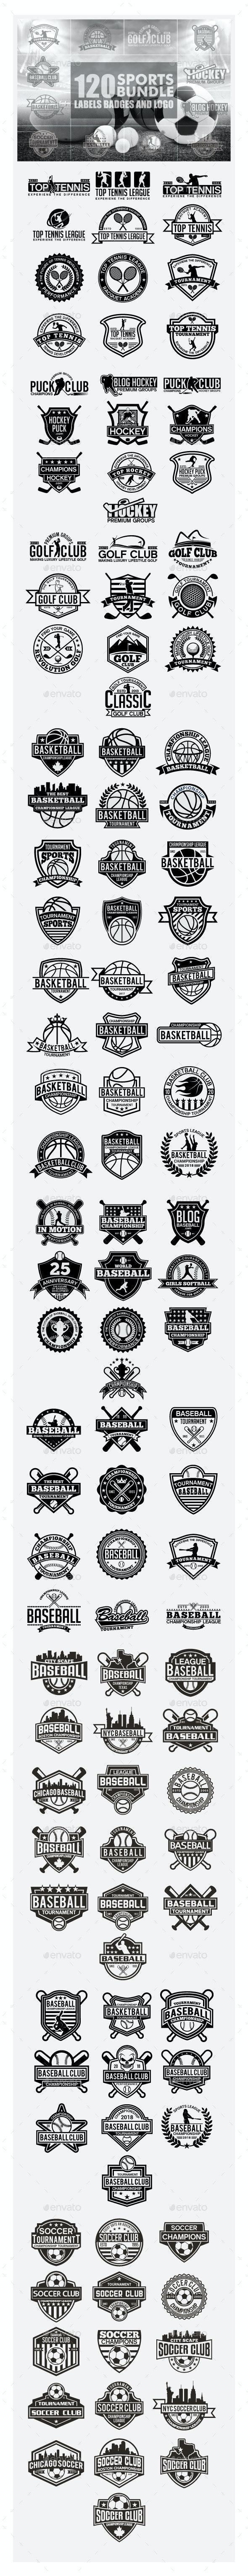 120 Sports Badges and Logo Bundle - Badges & Stickers Web Elements